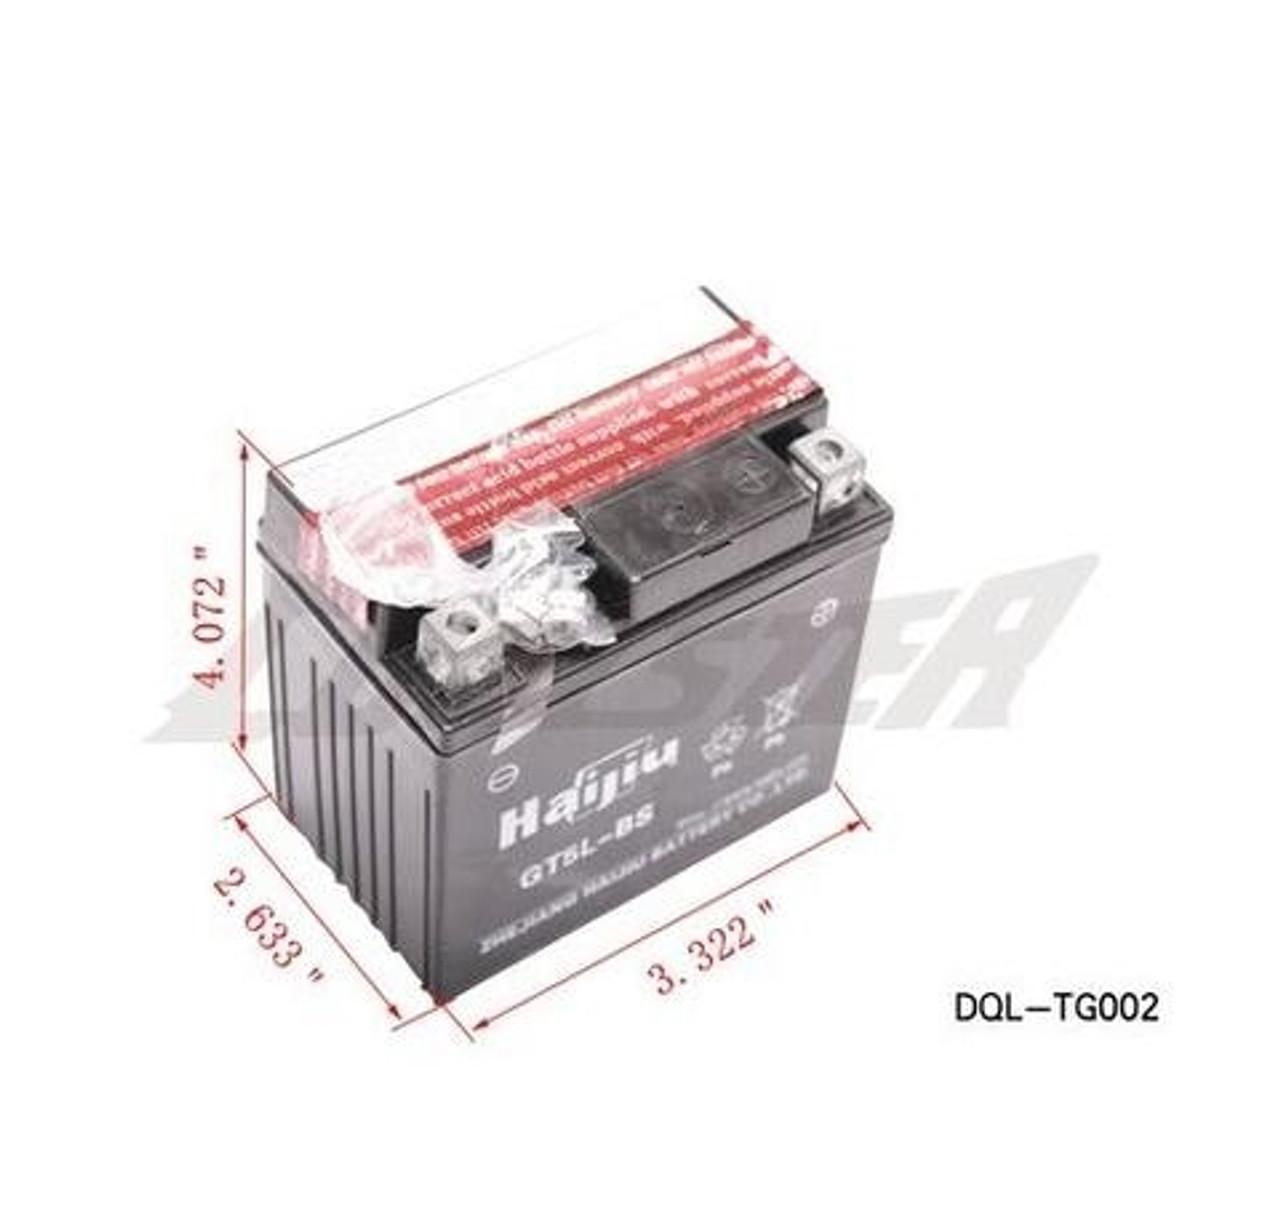 BATTERY 12V5AH (BA-7) (DQL-TG002)